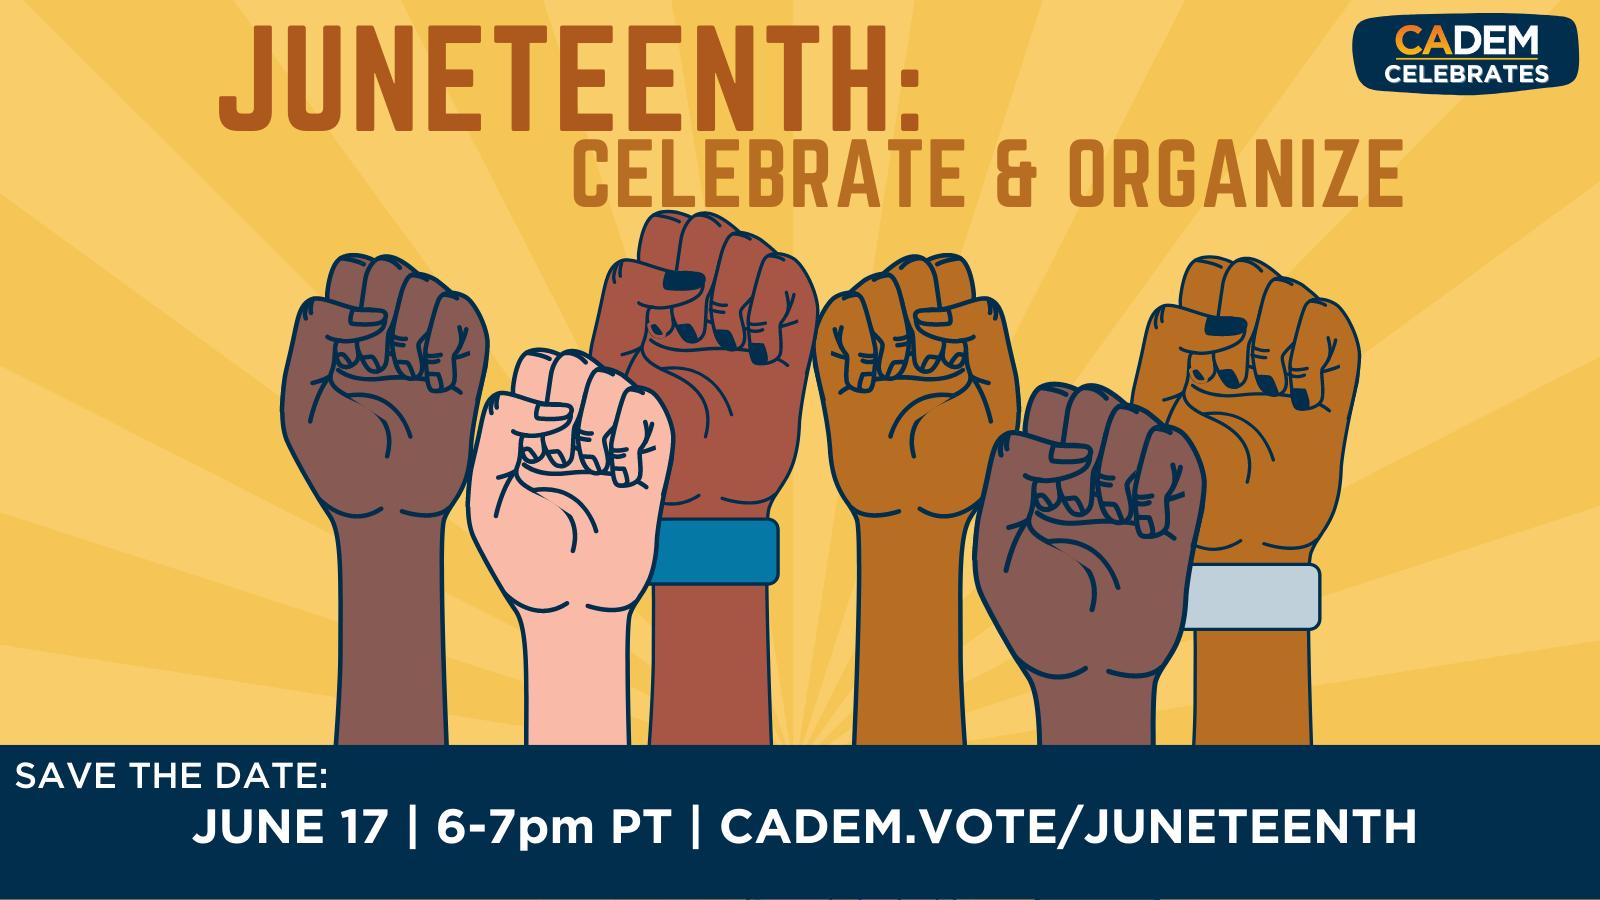 Juneteenth: Celebrate & Organize. Save the date: June 17 | 6-7 PM PST | cadem.vote/juneteenth